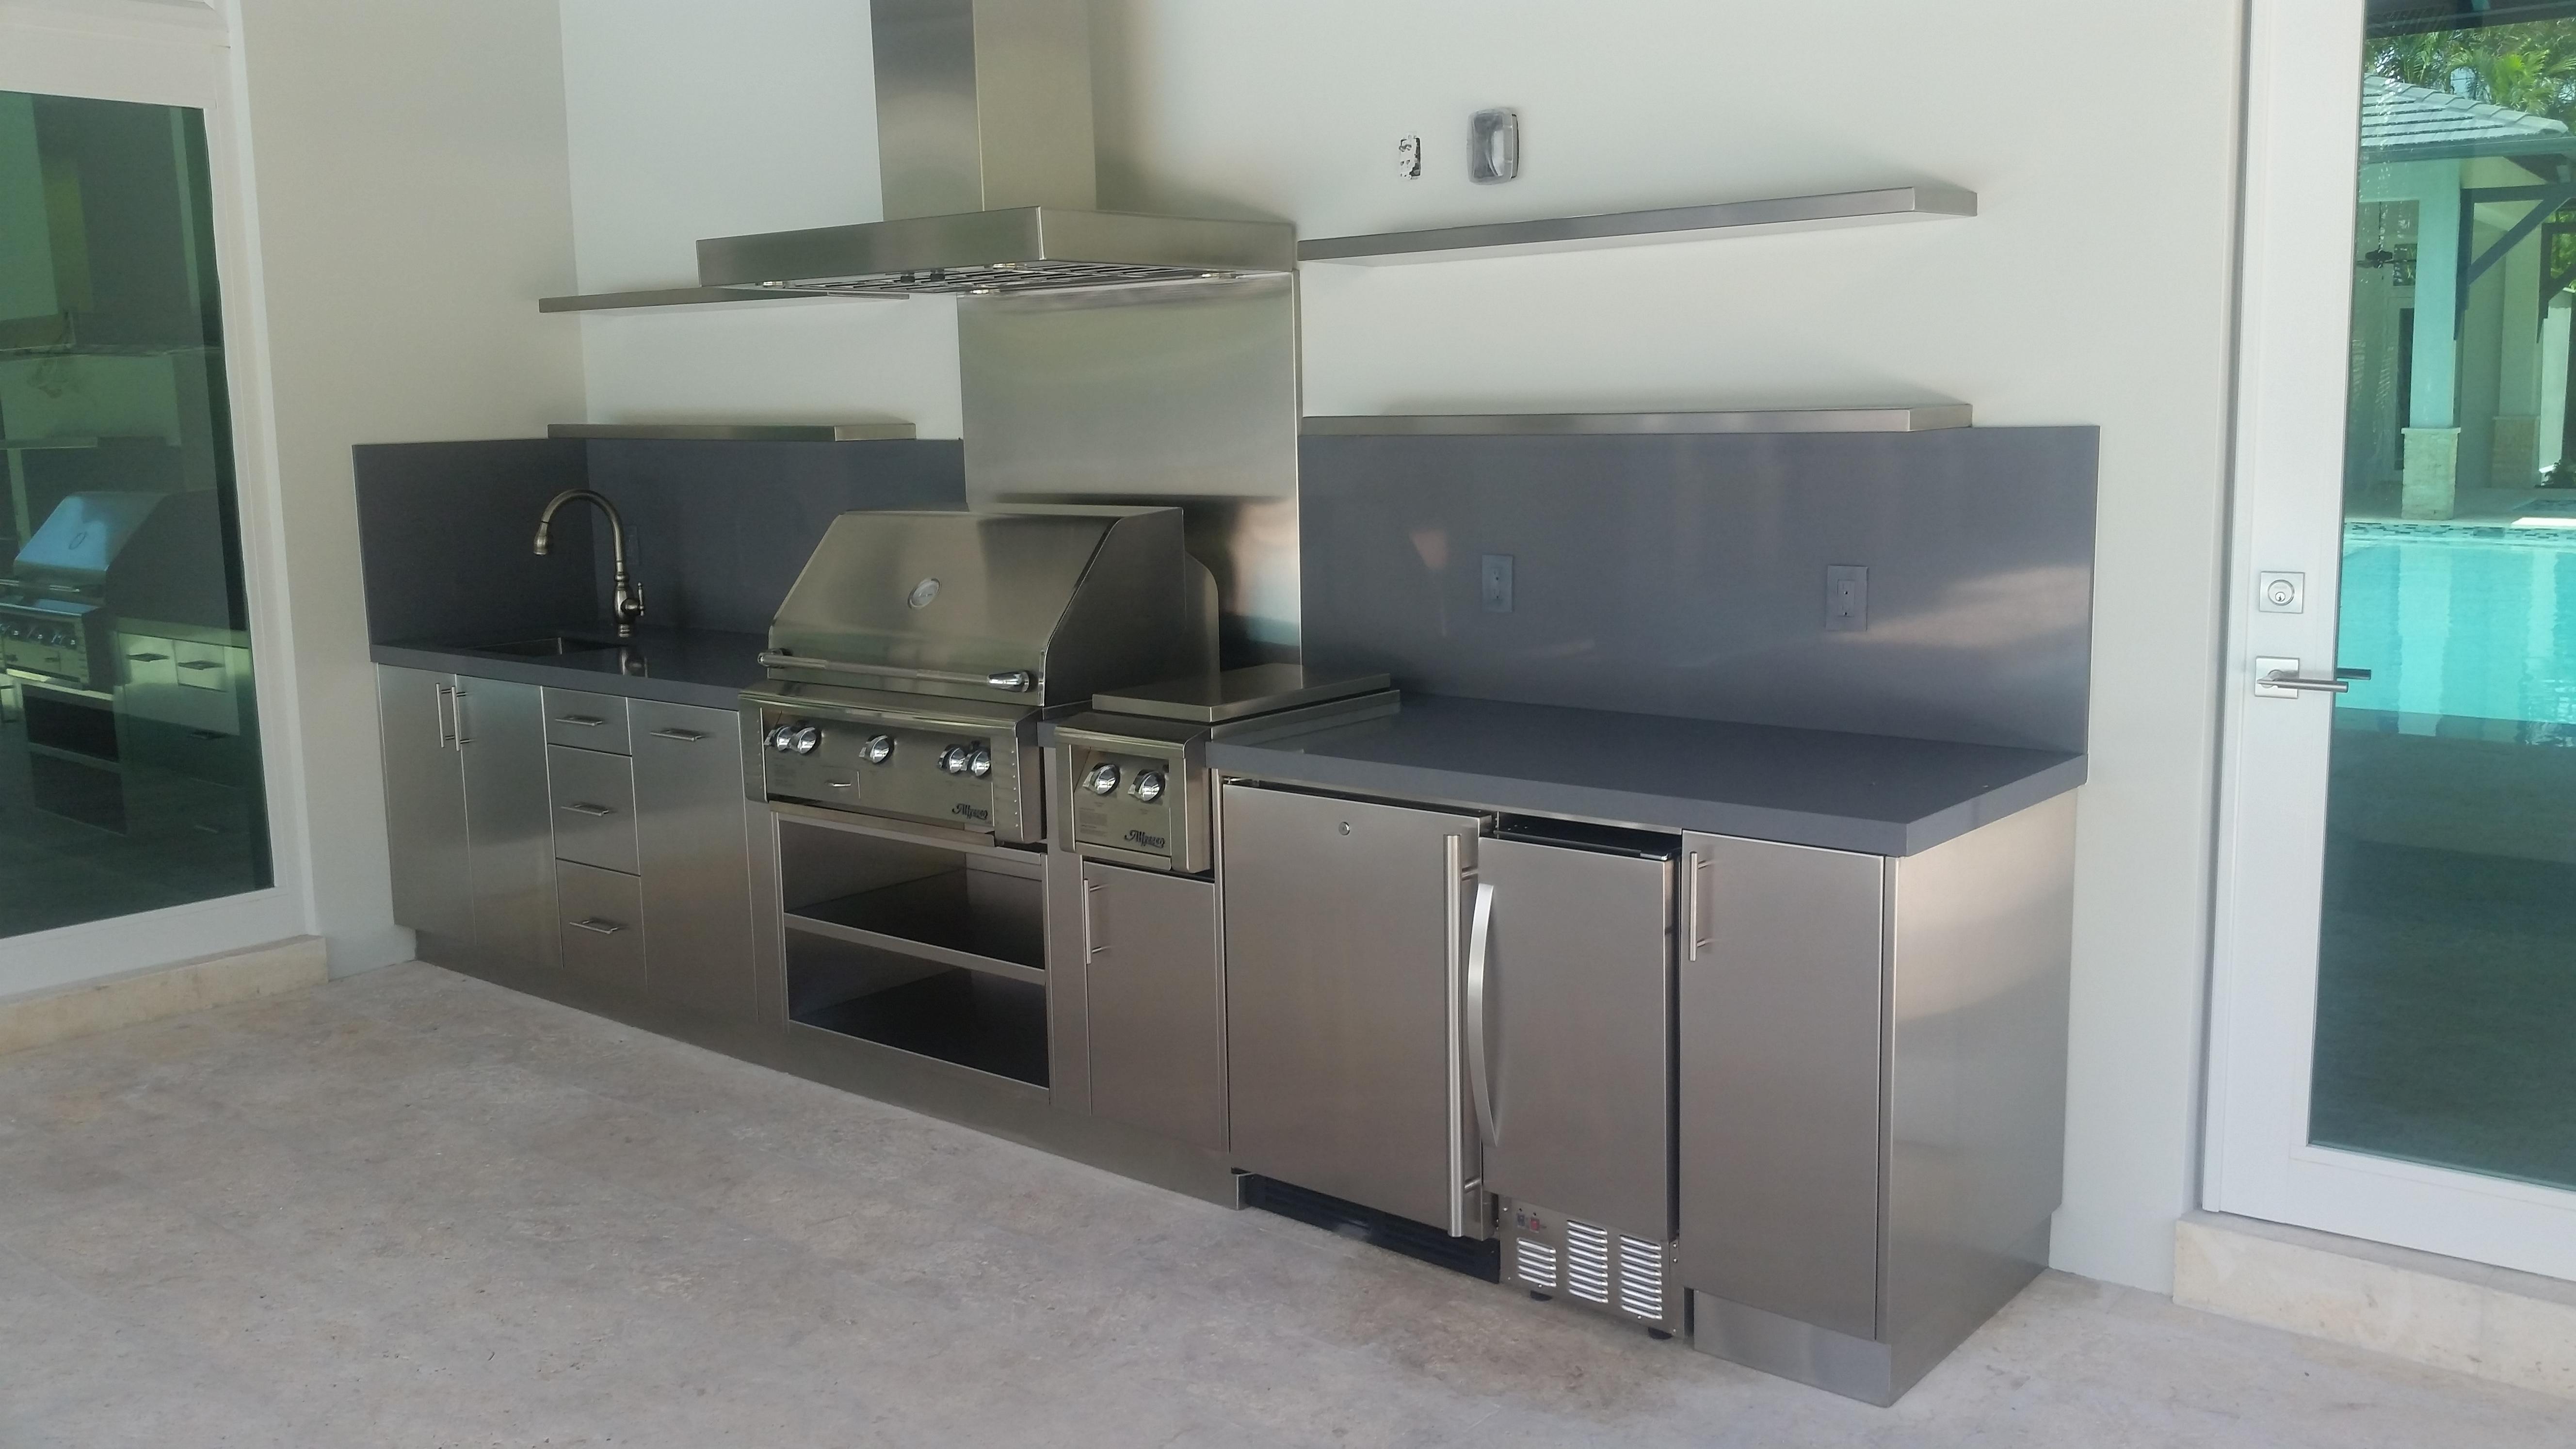 cabinets & hood (3)